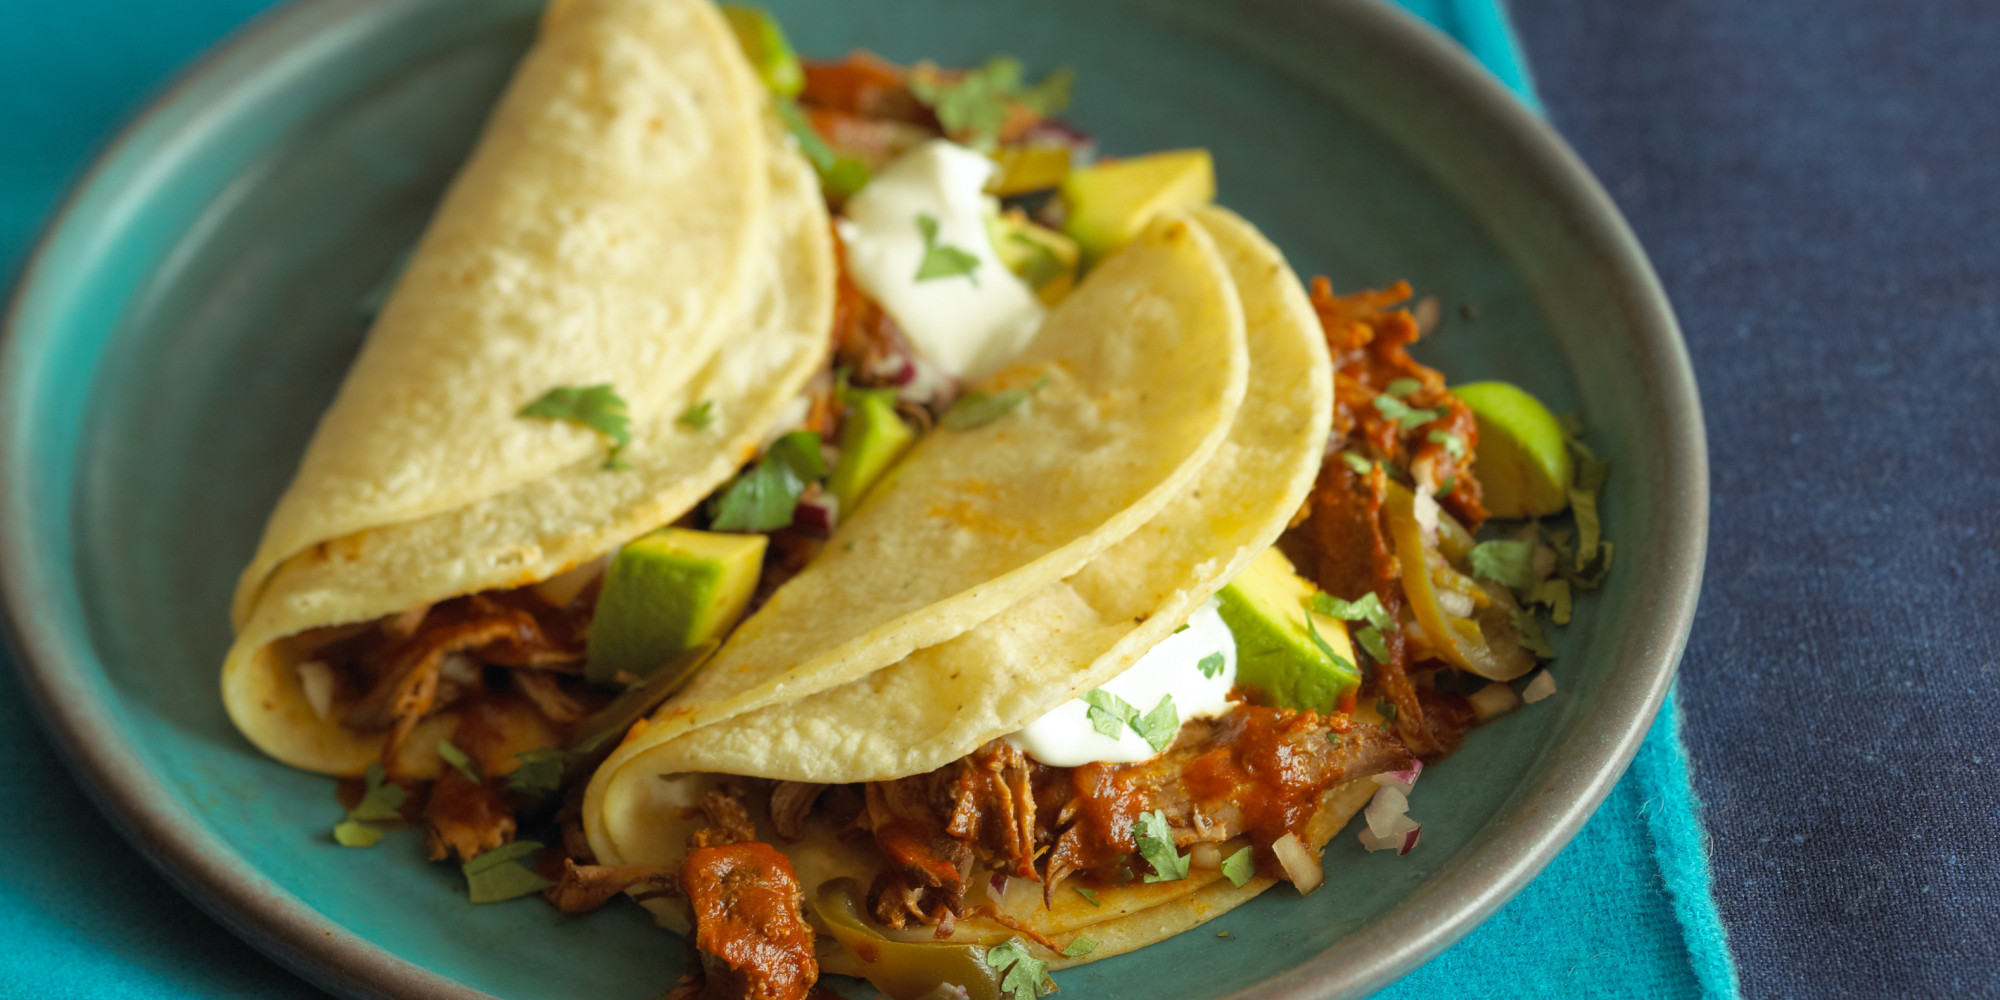 Best Authentic Mexican Food In San Antonio Tx